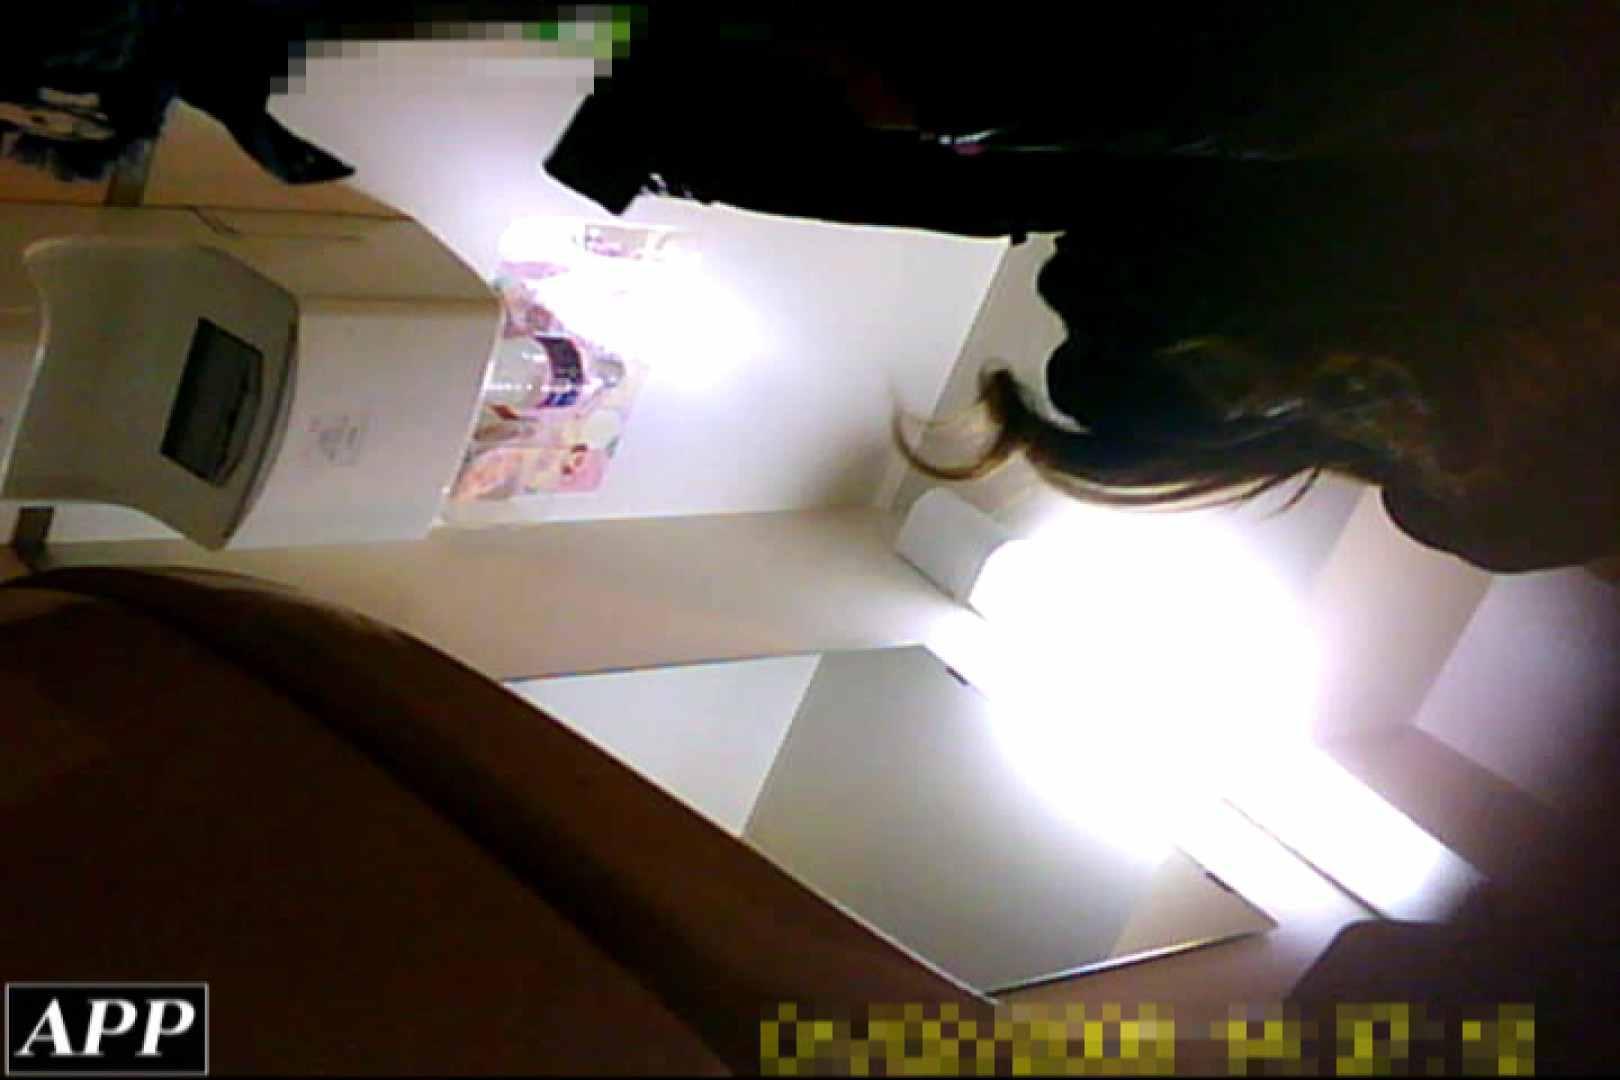 3視点洗面所 vol.023 洗面所 | OLセックス  85画像 39